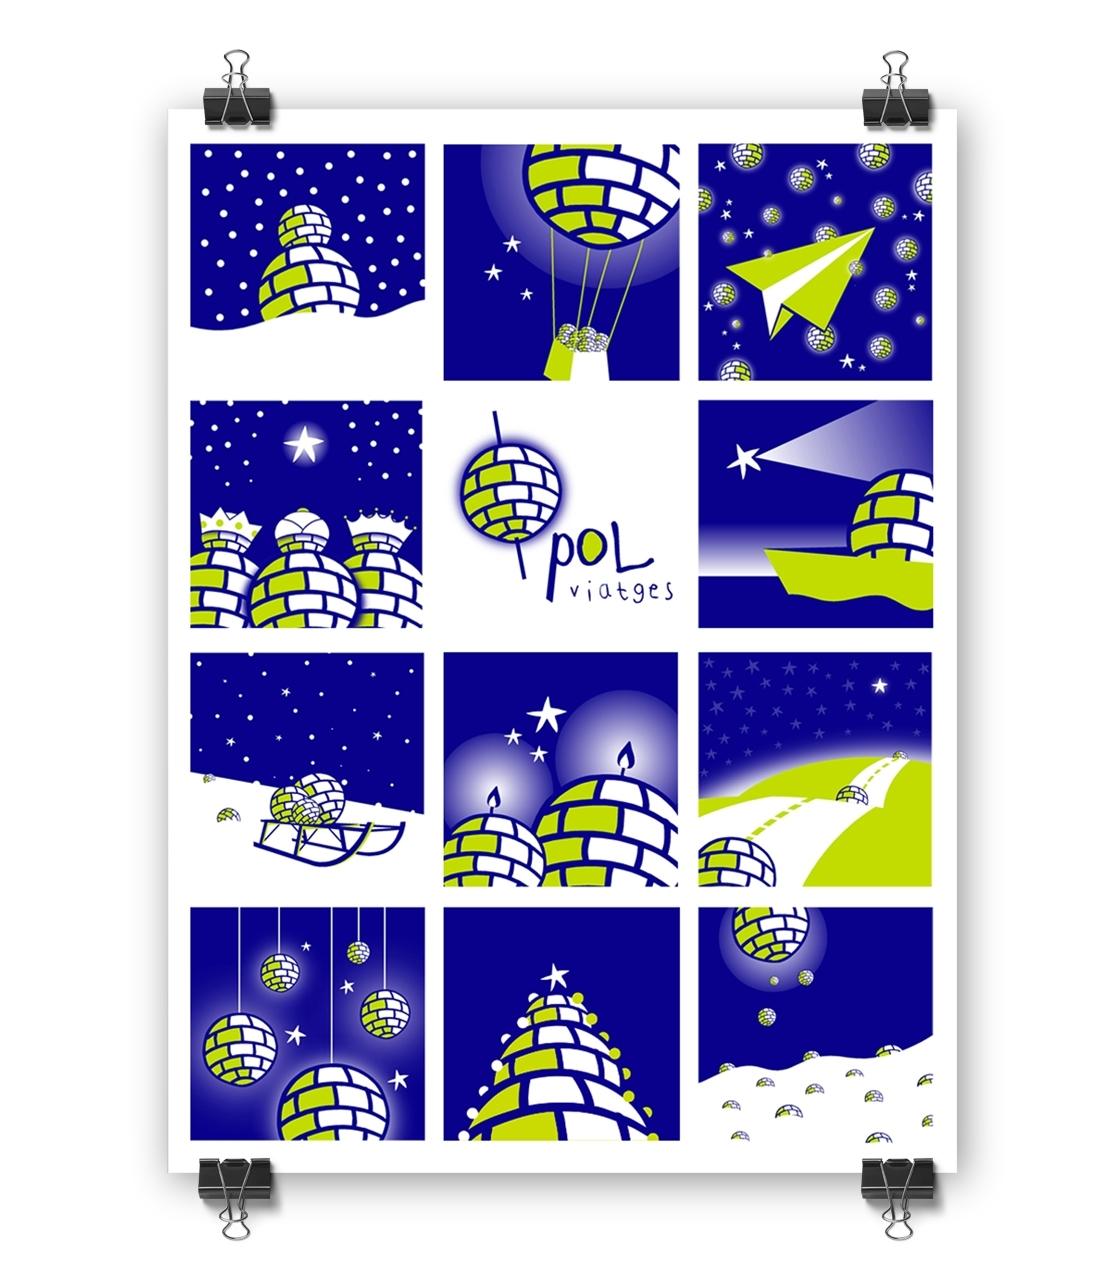 Pol-viatges-Nadal